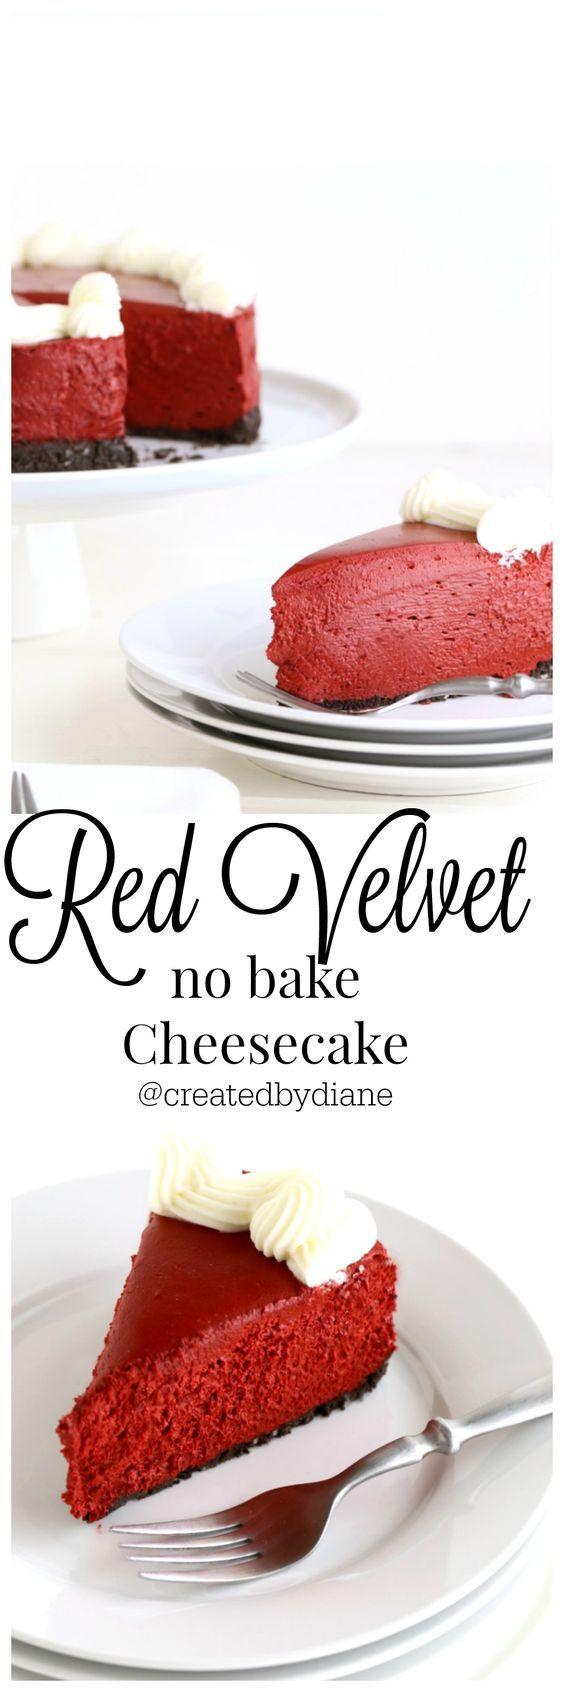 nice Red Velvet no bake Cheesecake